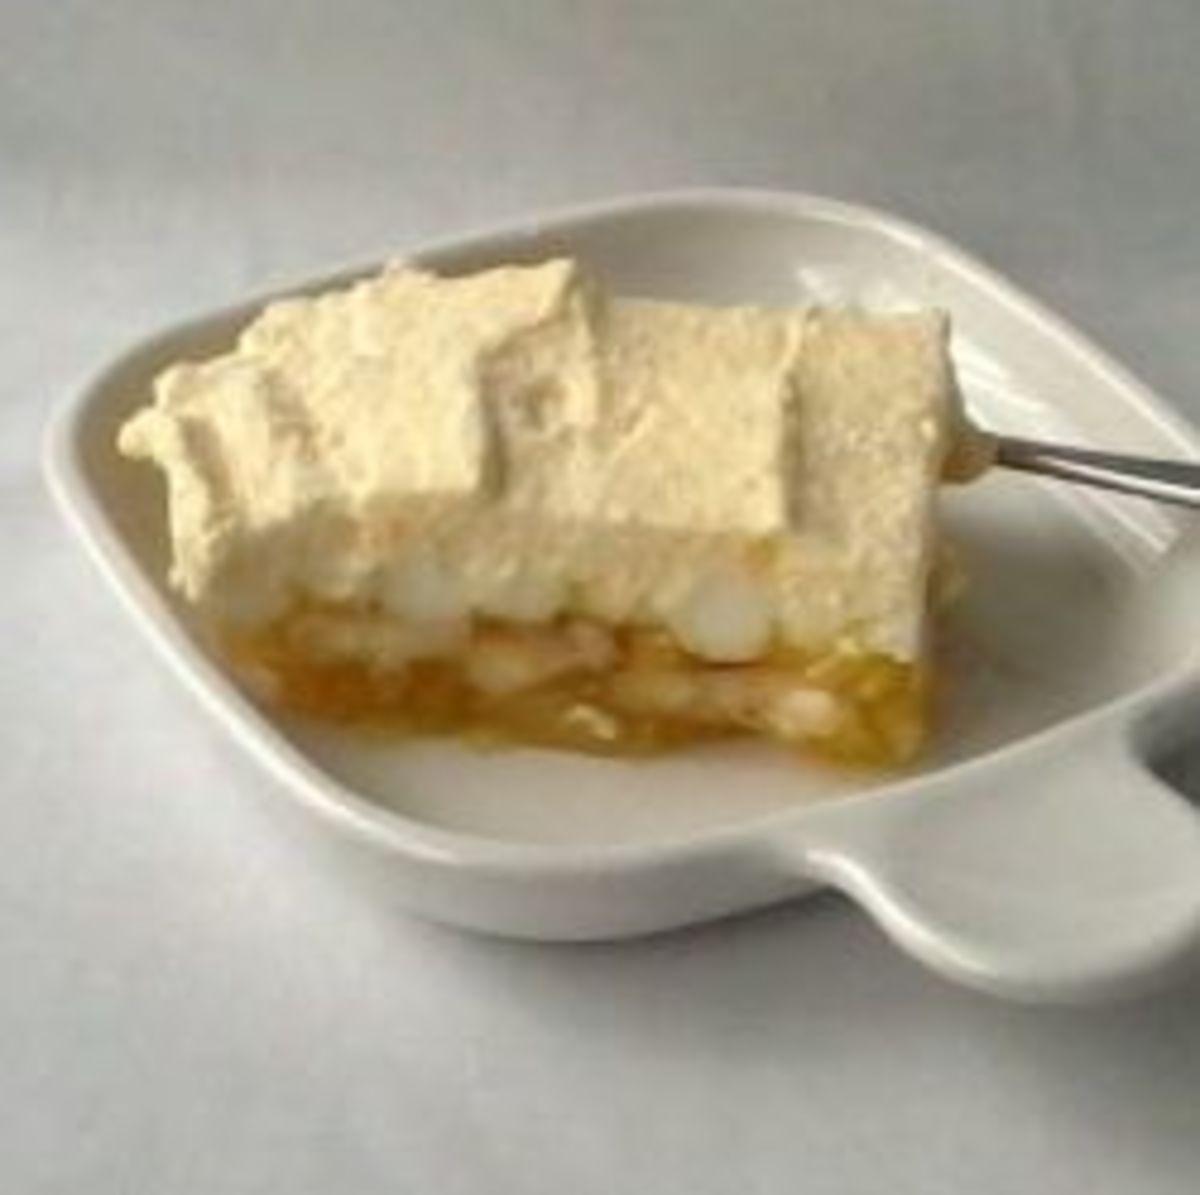 Lemon Jell-O, a classic American dessert.